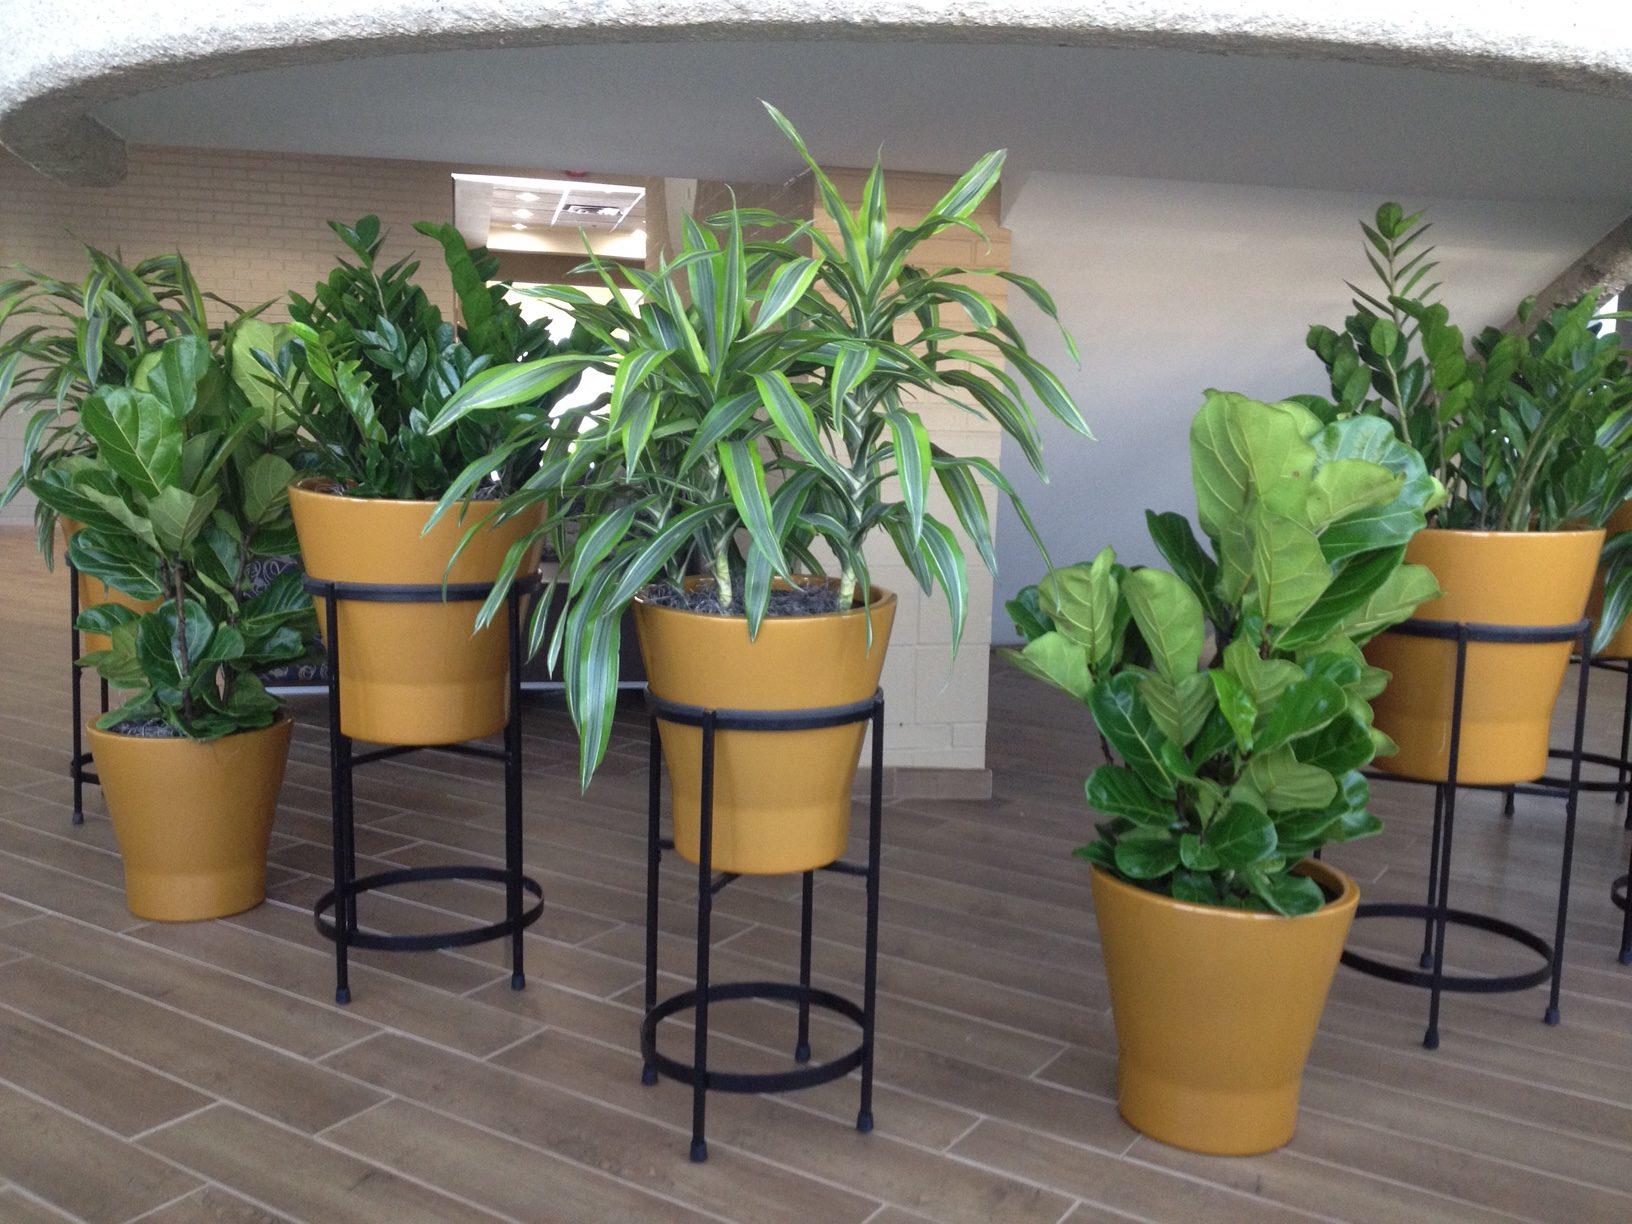 Planters Assorted Foliage - Plantopia - Interior Plant Service - Louisville